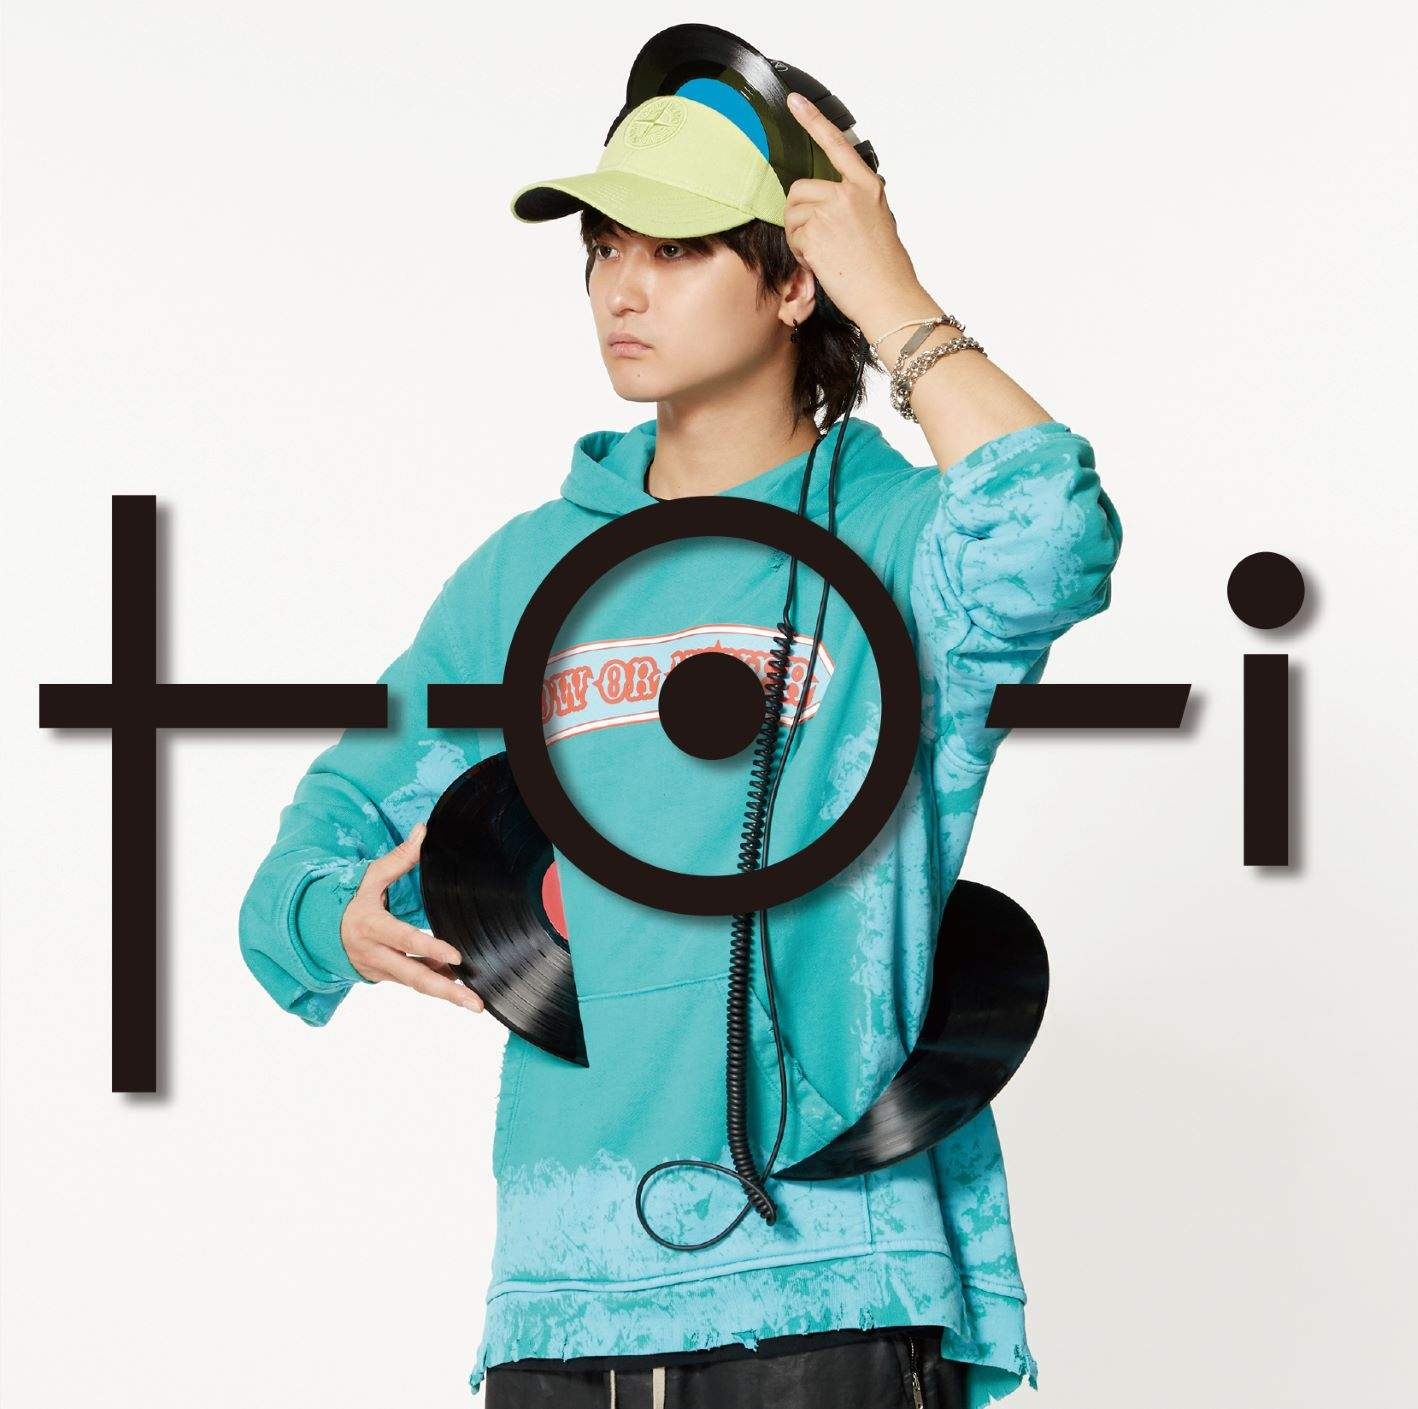 DJ To-i 「TOY BOX Ⅱ -All Night Mix-」にサニーデイ・サービスの楽曲が2曲収録されています